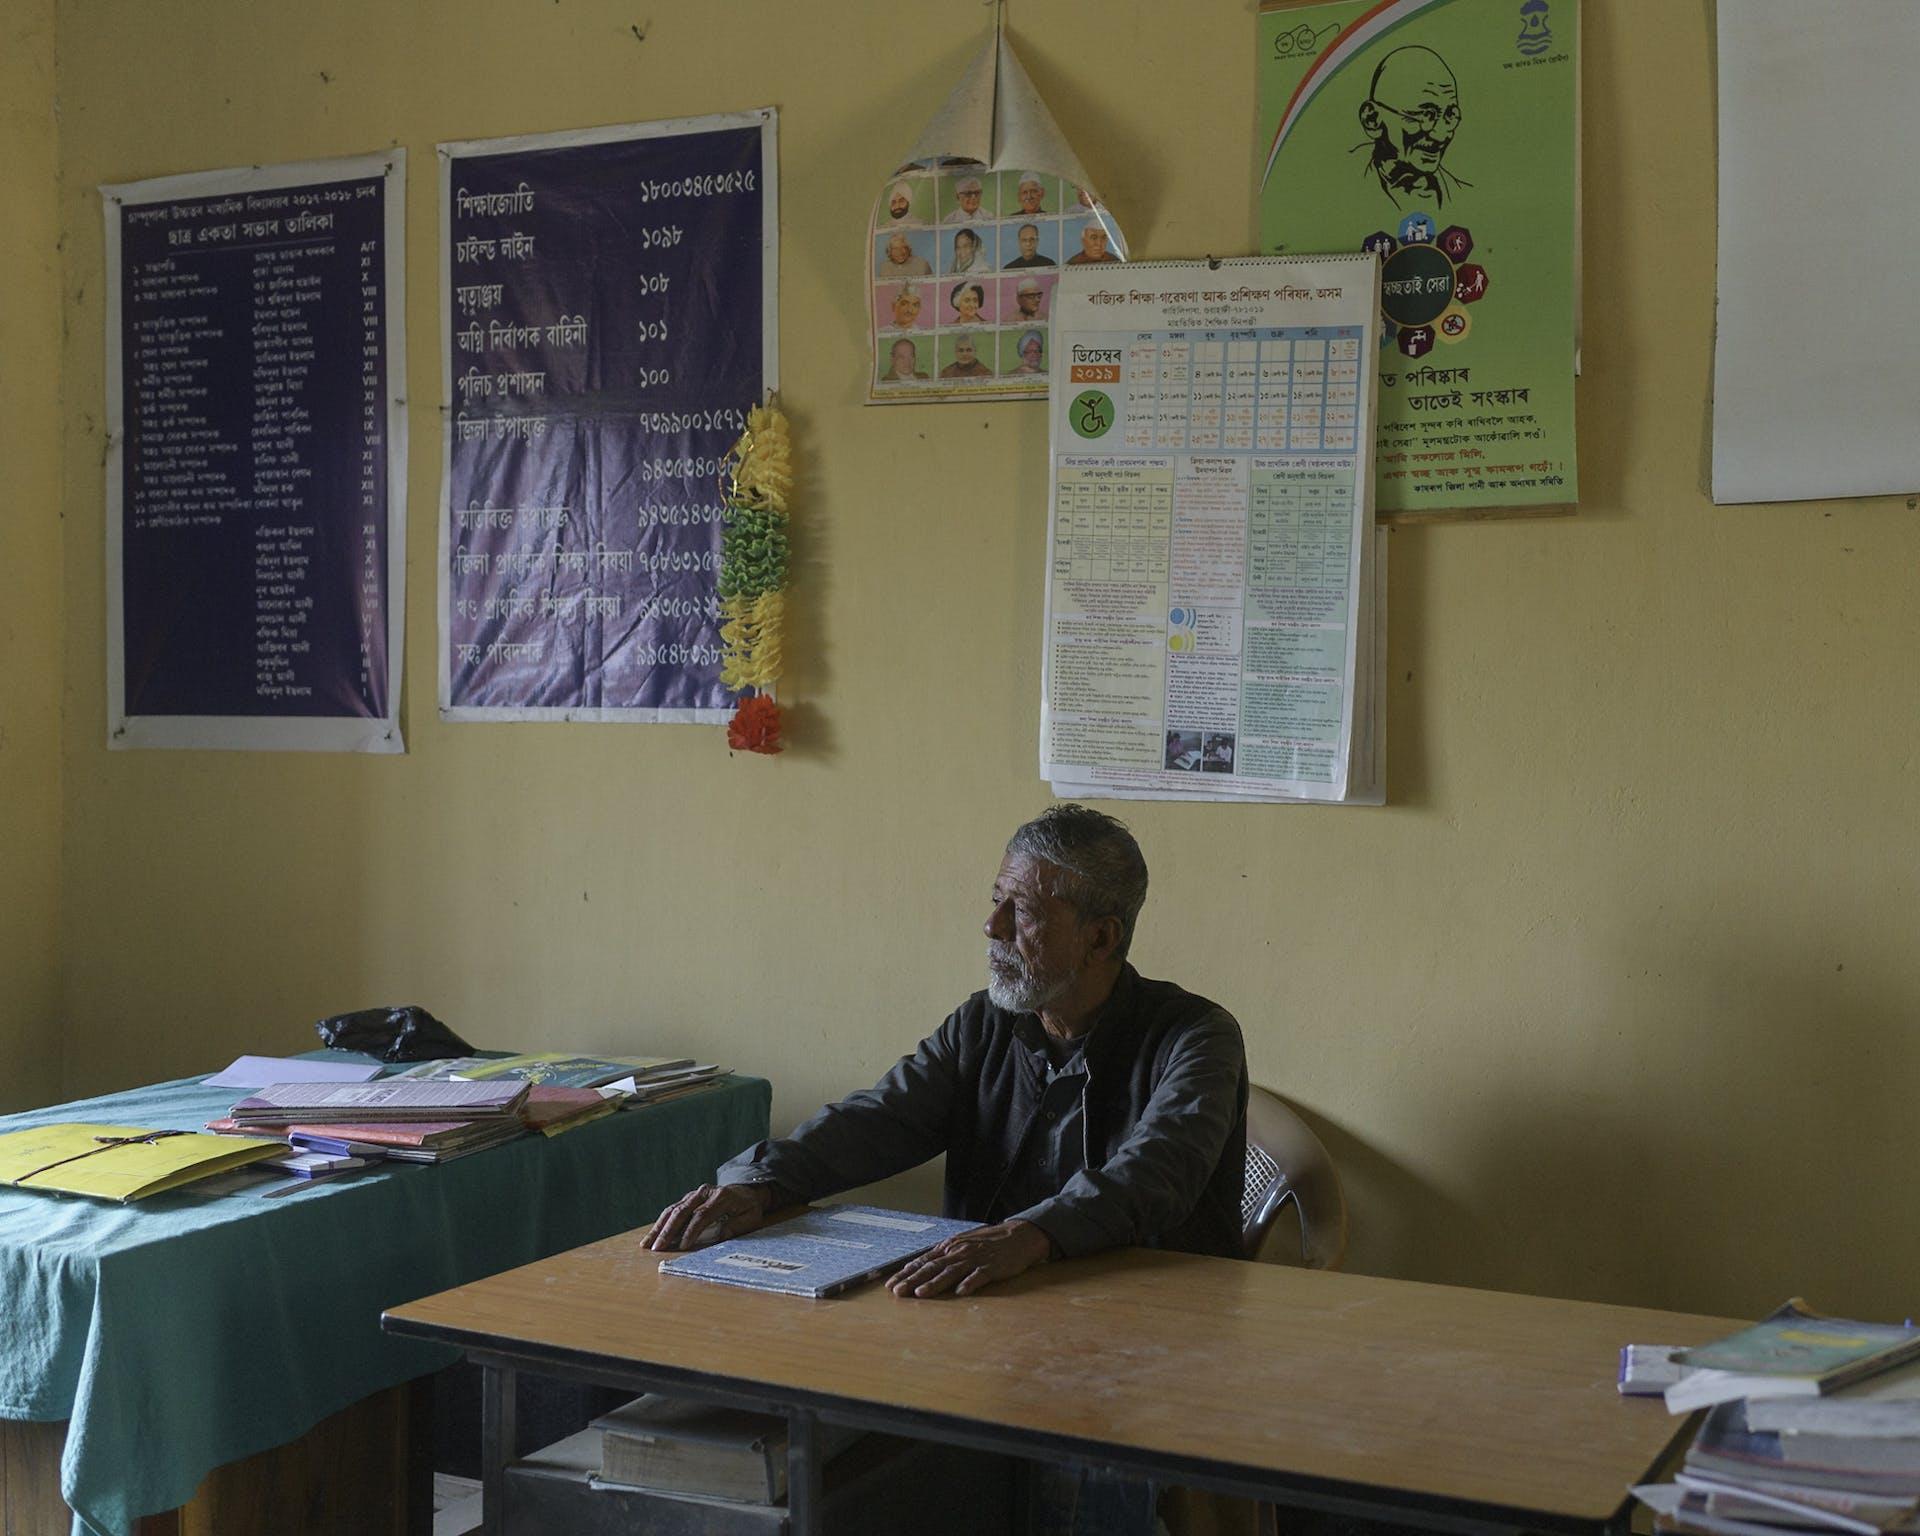 Anwar Hussain Mullah, former headmaster of Champupara High School. Picture credit: Prakash Bhuyan.